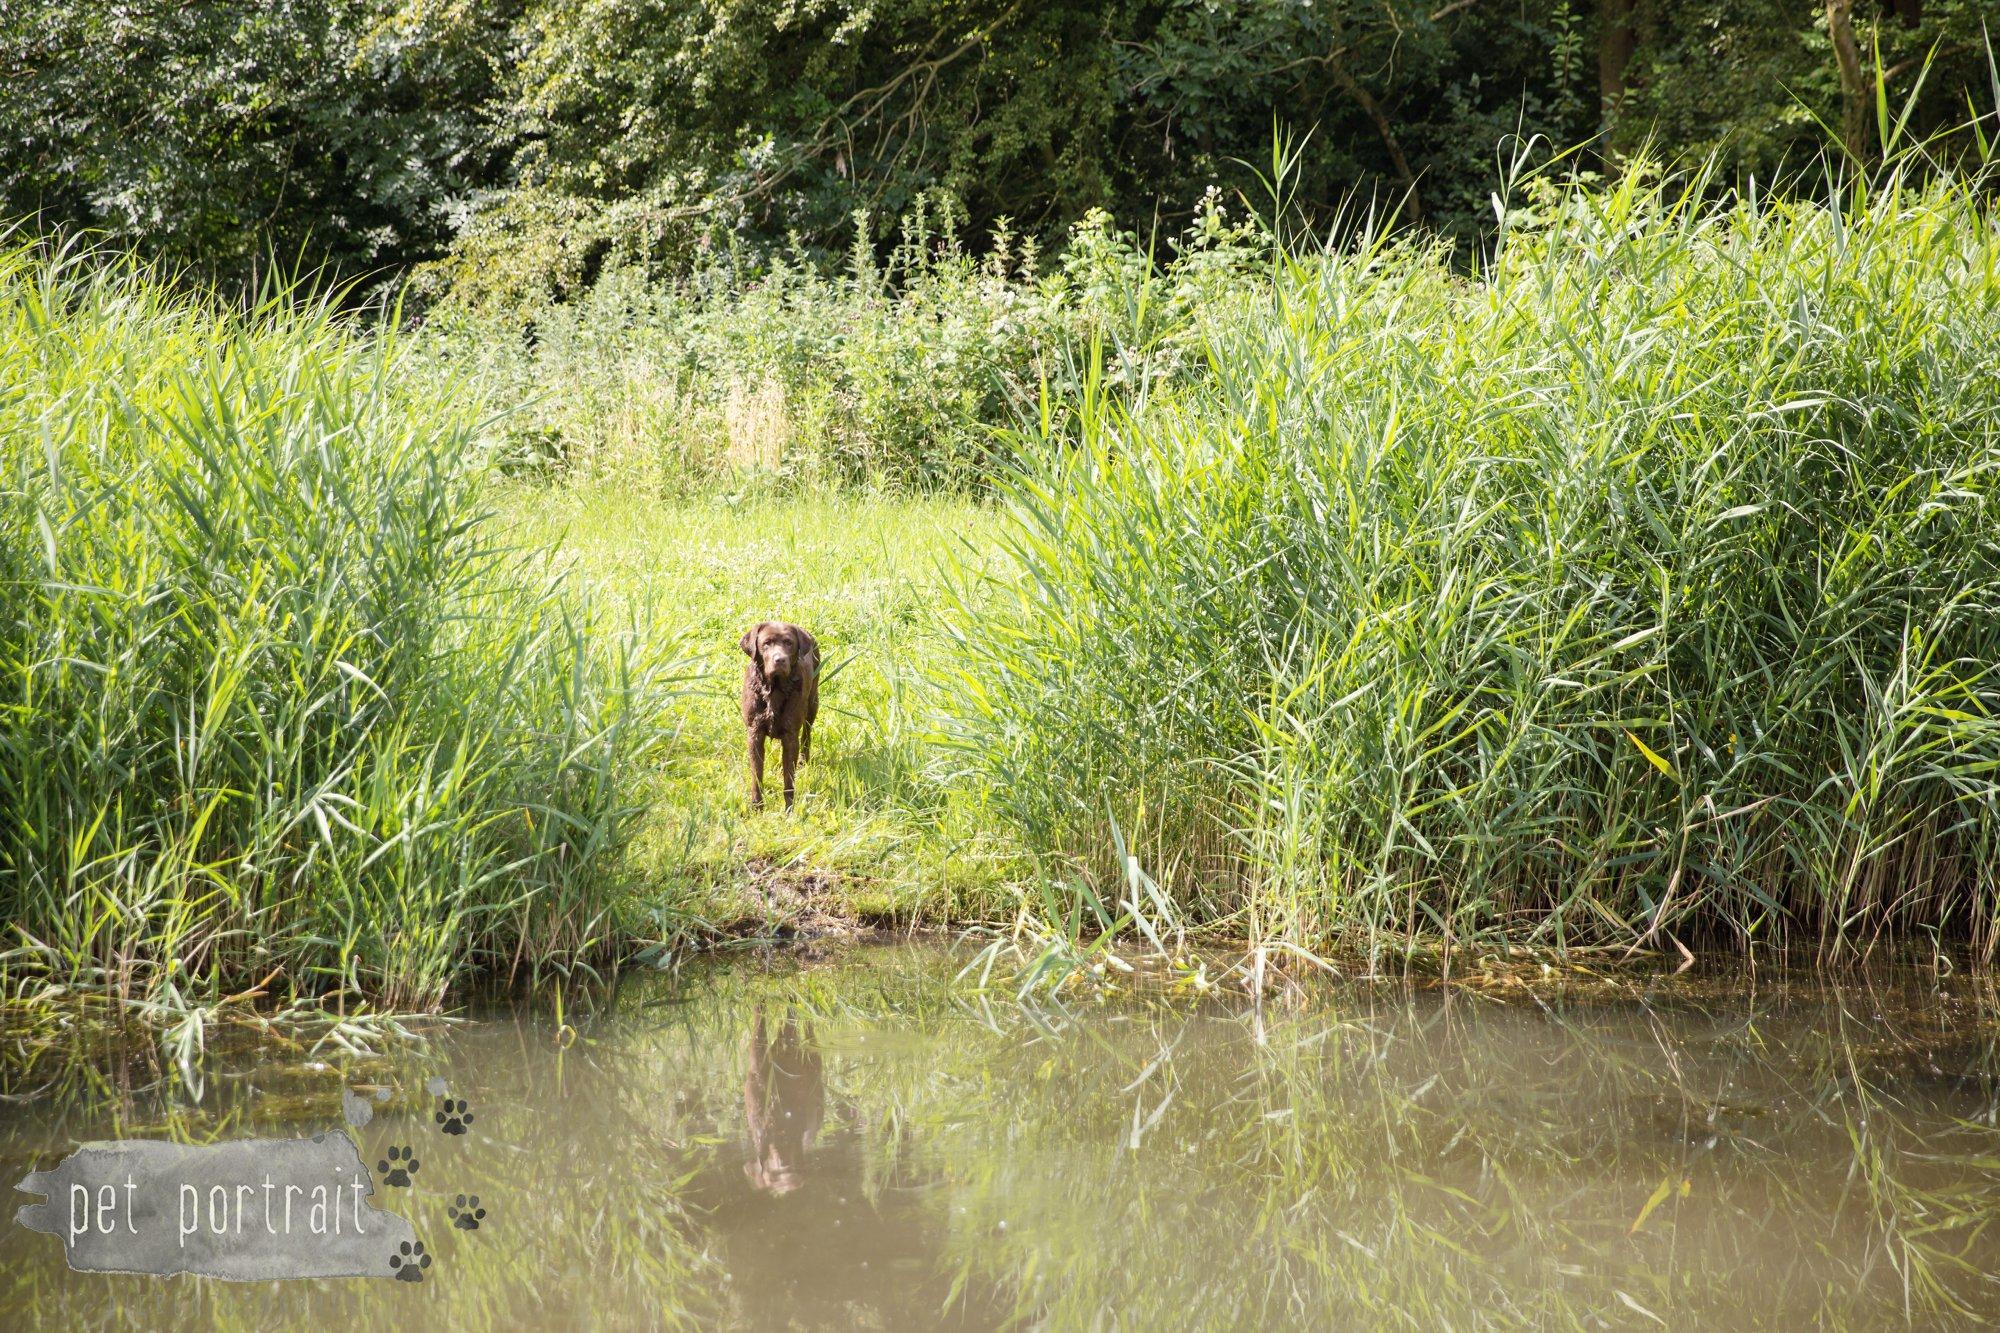 Hondenfotograaf Lelystad - Beloved Dier en Baasje fotoshoot-17